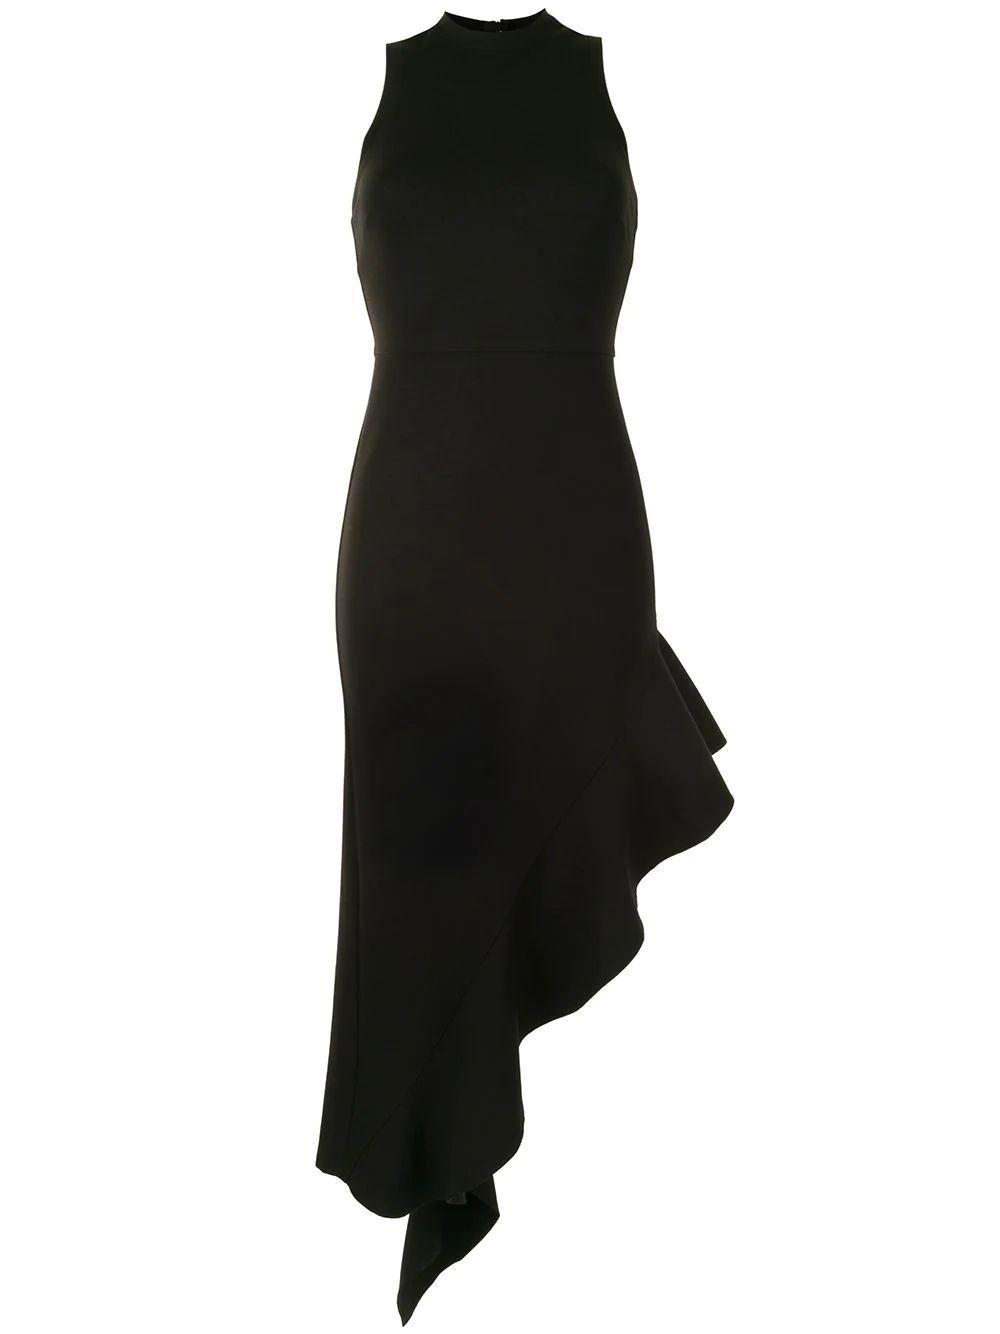 Adva Asymmetrical Dress Item # ADVA